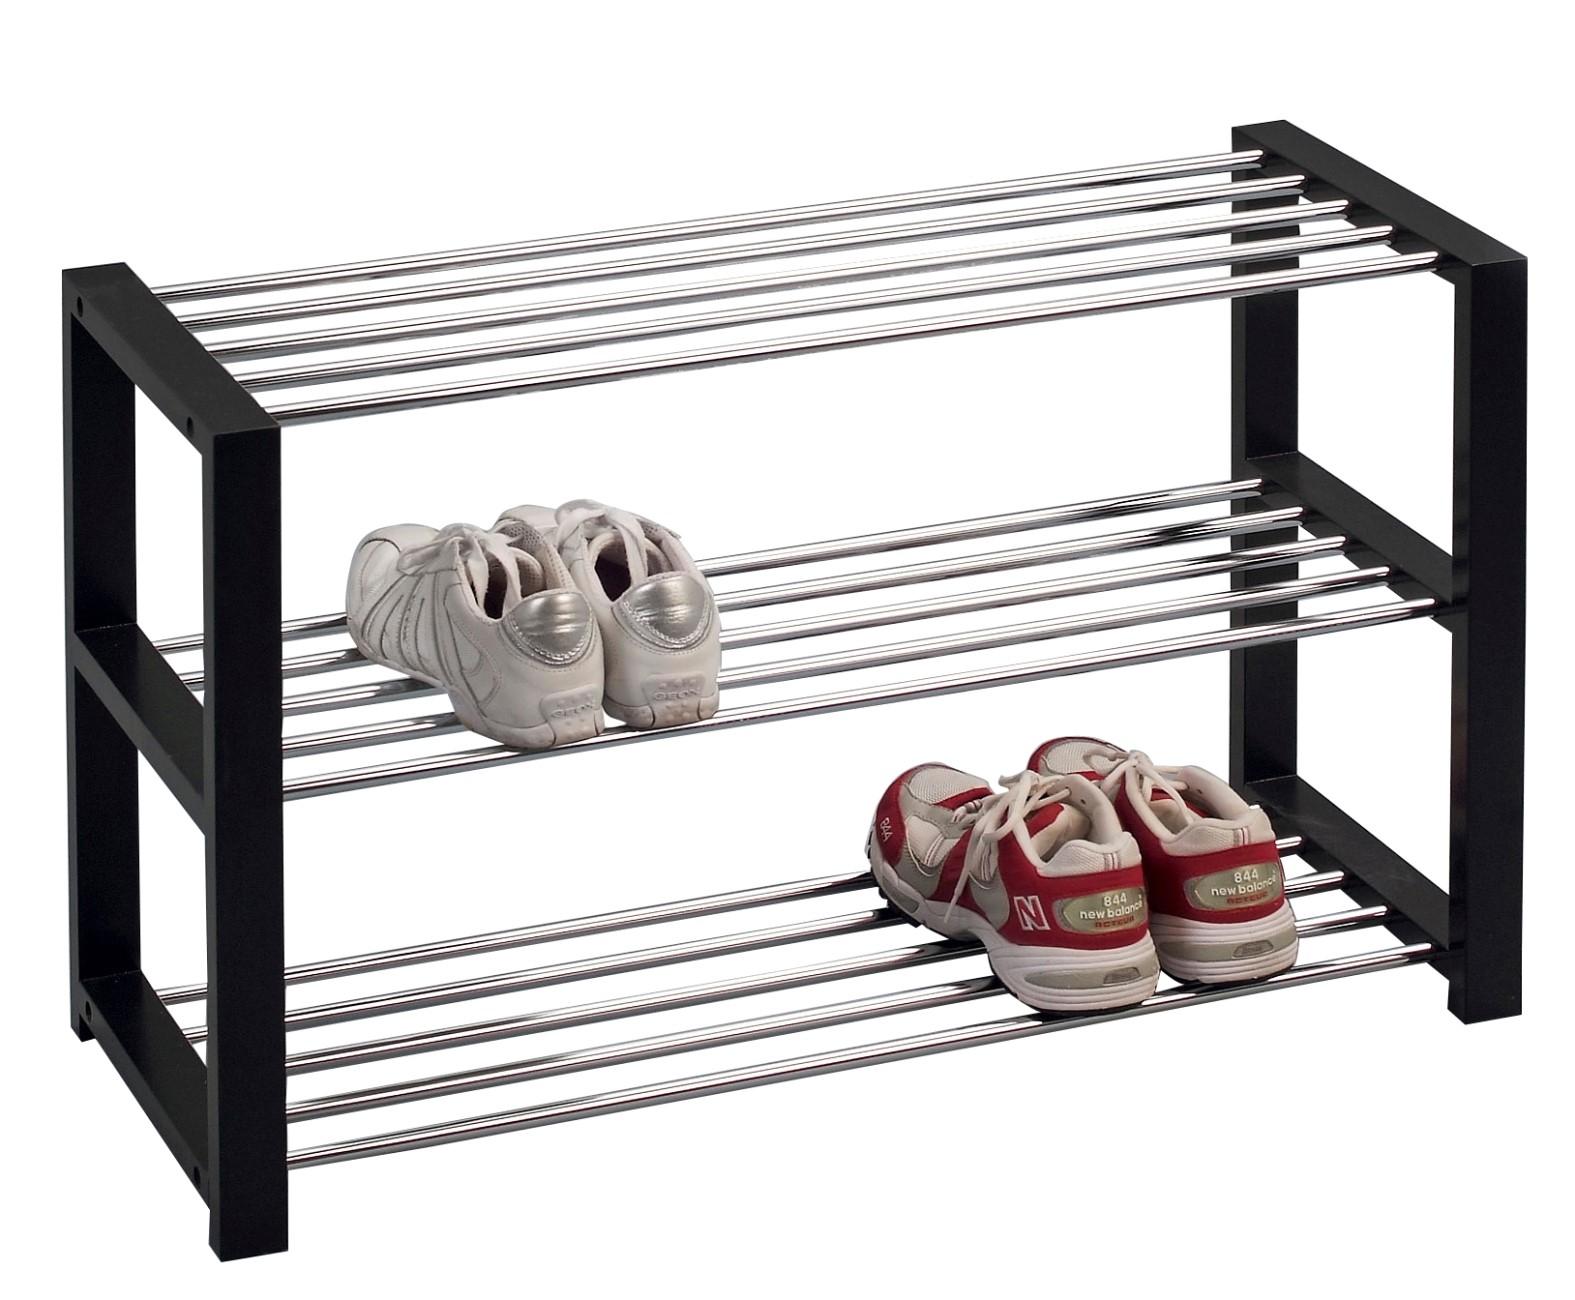 standregal regal b cherregal awel xl nr 1 111 x 80 cm buche massiv ebay. Black Bedroom Furniture Sets. Home Design Ideas